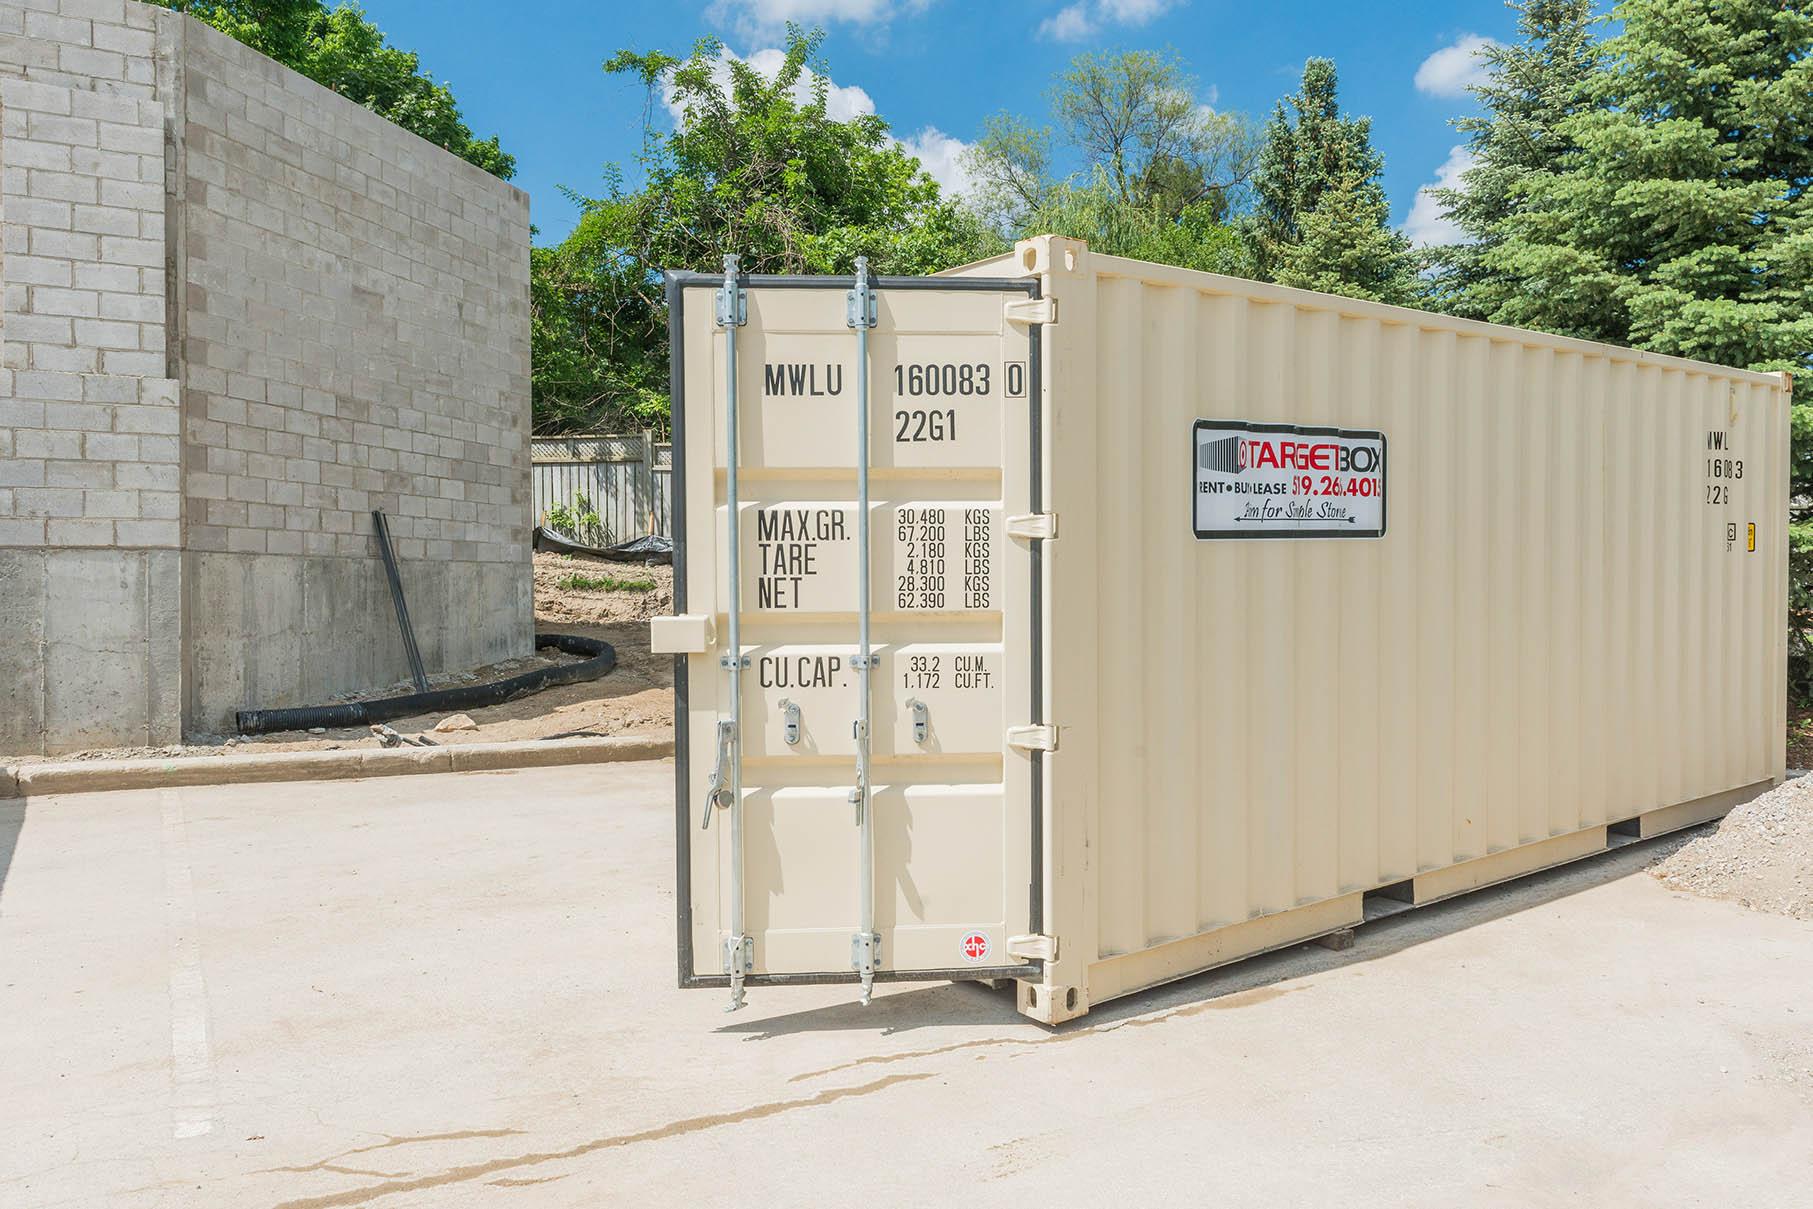 Storage for Contractors in Kitchener